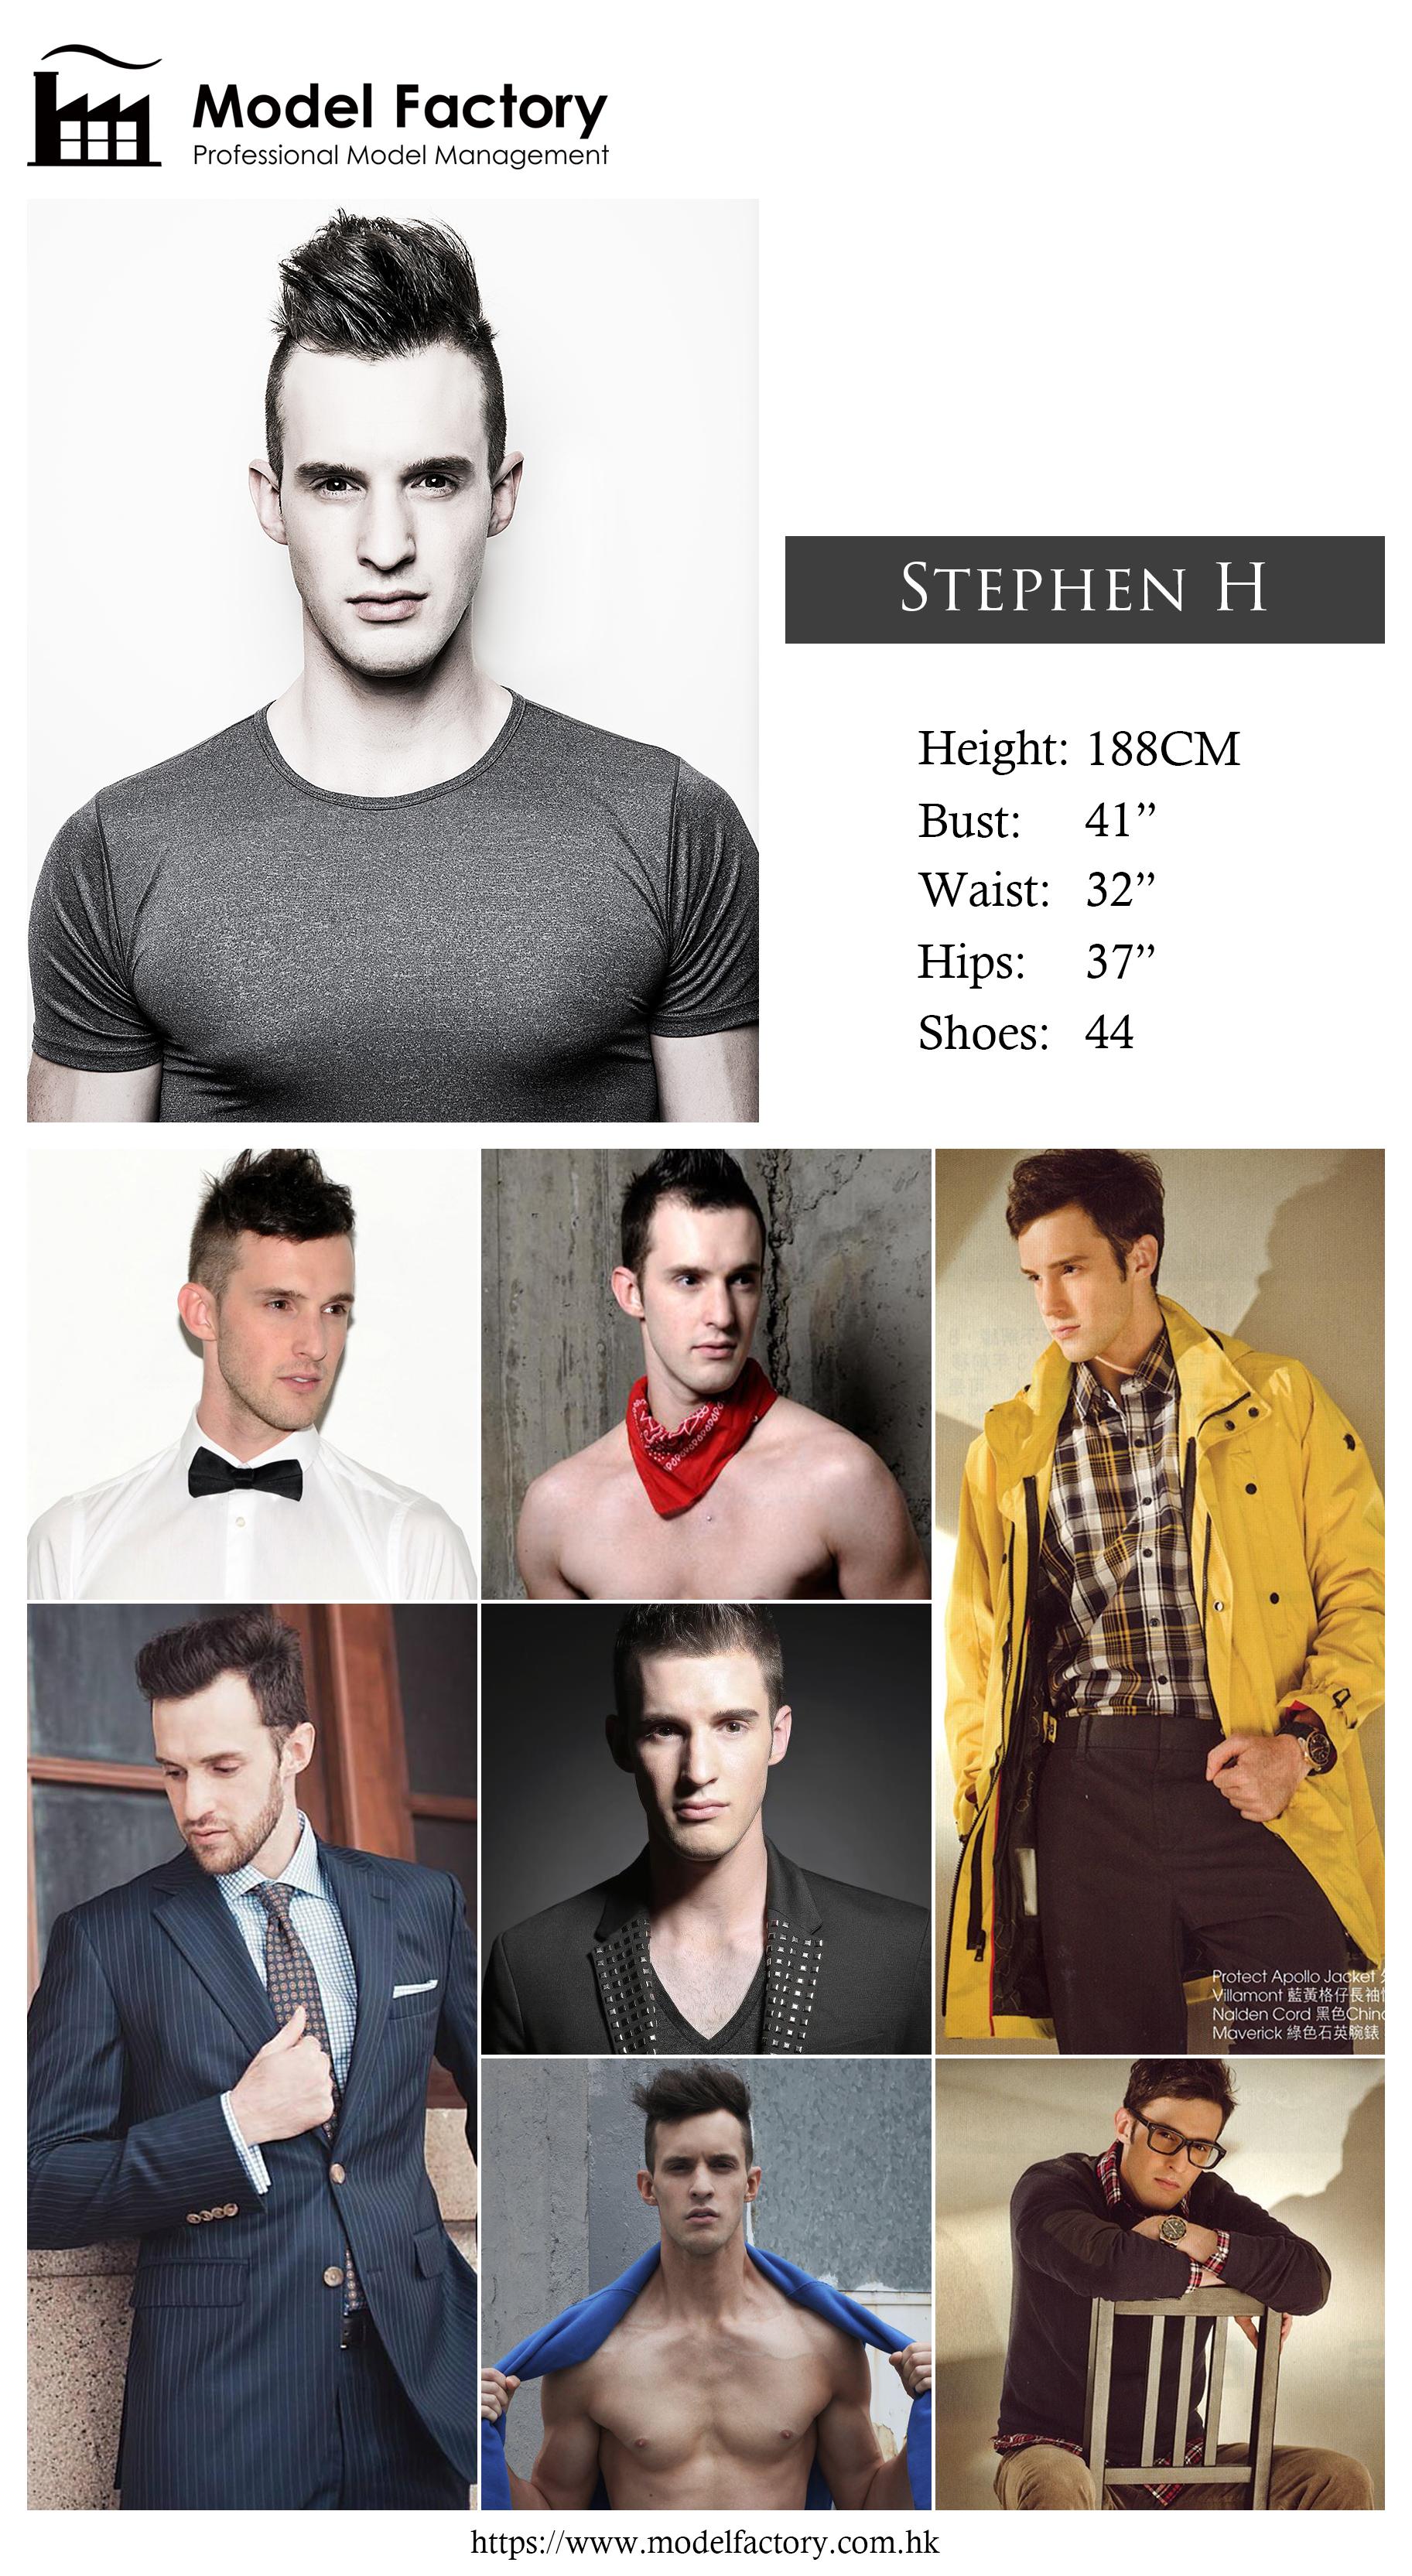 Model Factory Caucasian Male Model StephenH